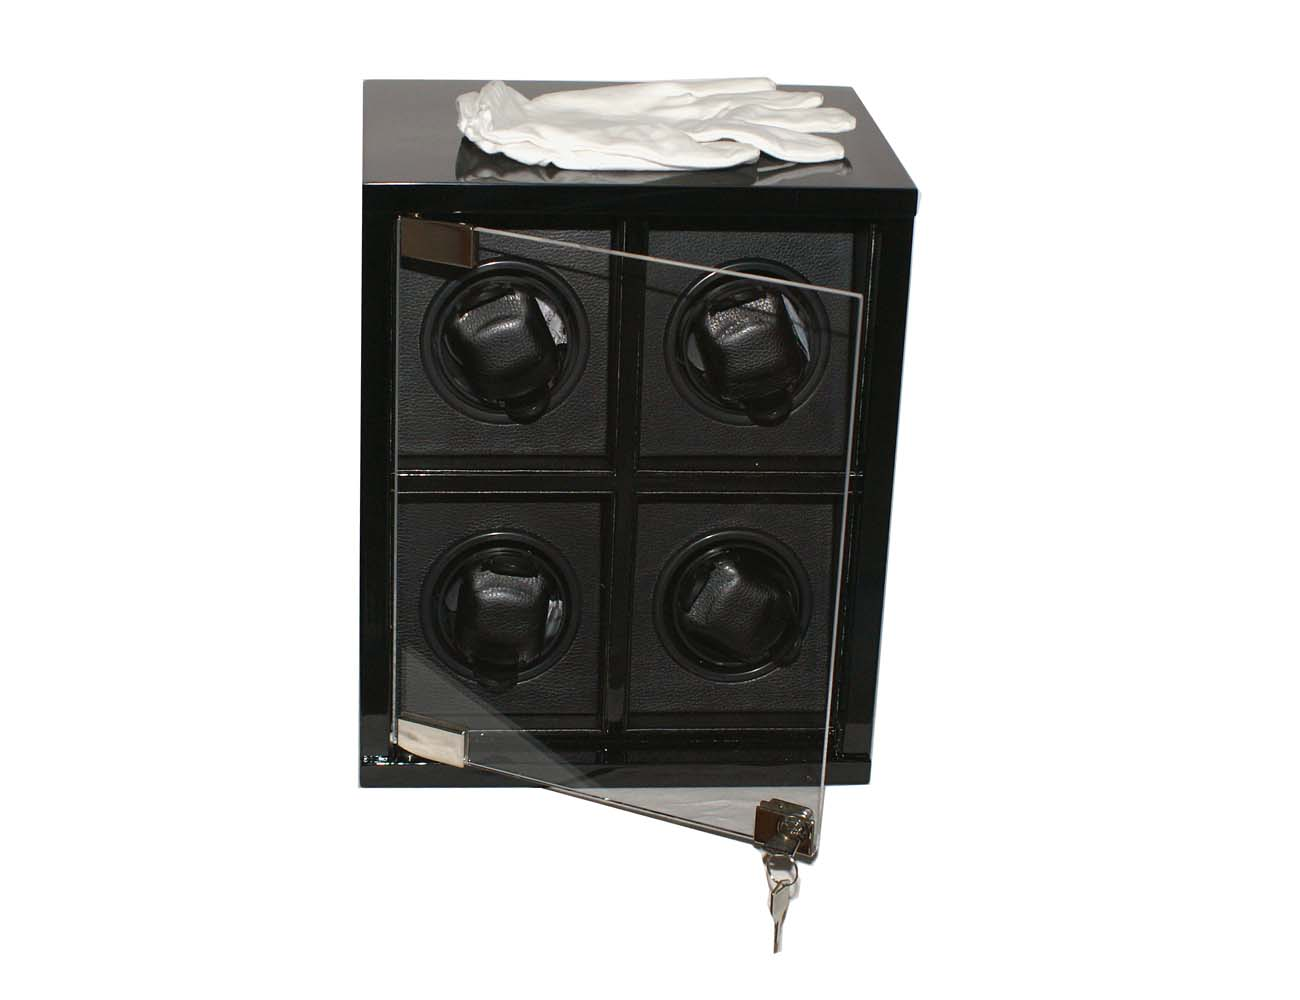 luxus uhrenbeweger f r 4 uhren lifestyle topshop. Black Bedroom Furniture Sets. Home Design Ideas